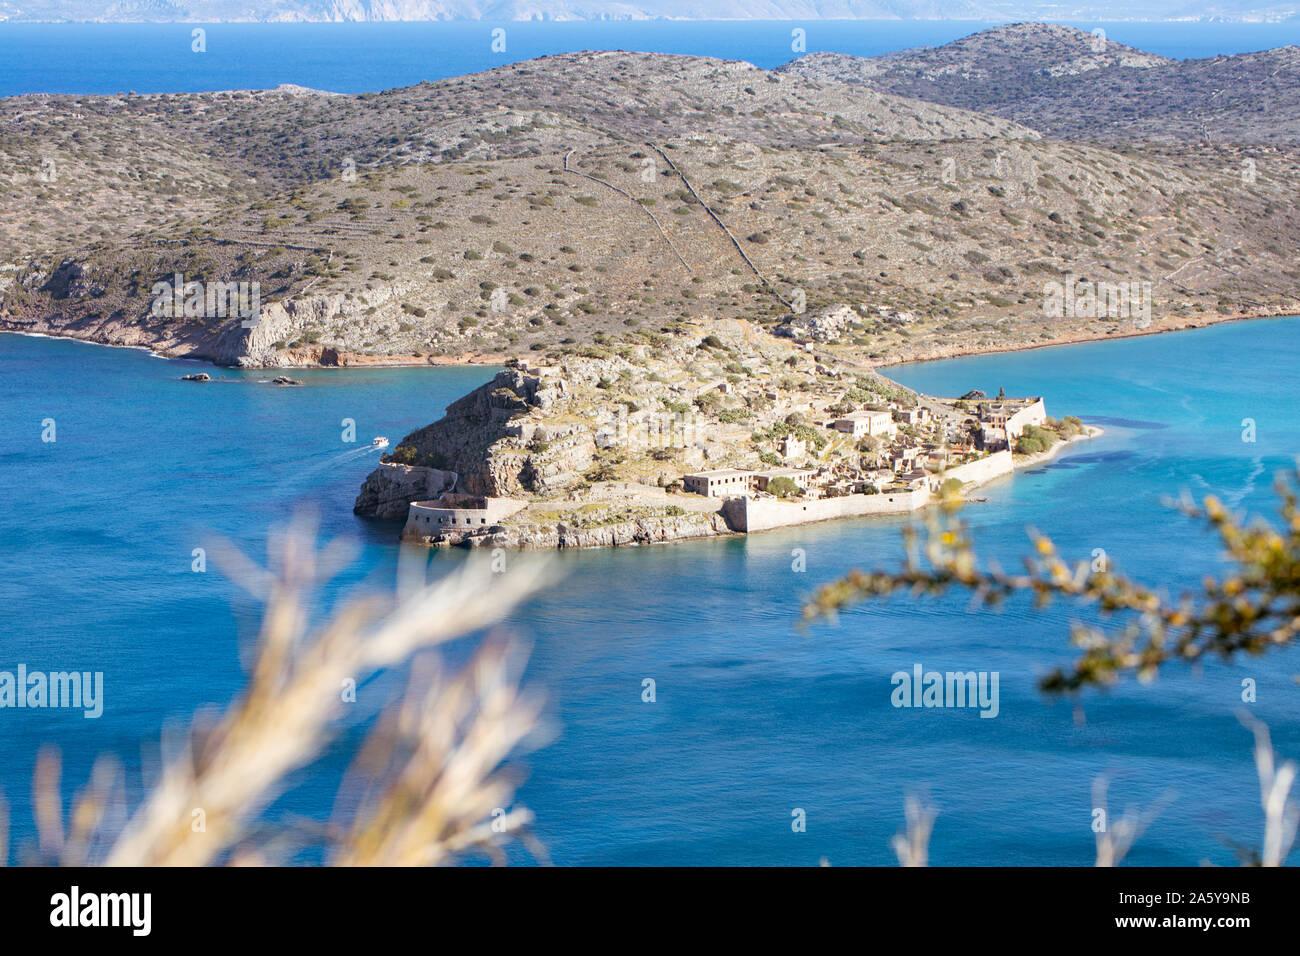 Spinalonga Island, panoramic view. Crete, Greece. Stock Photo